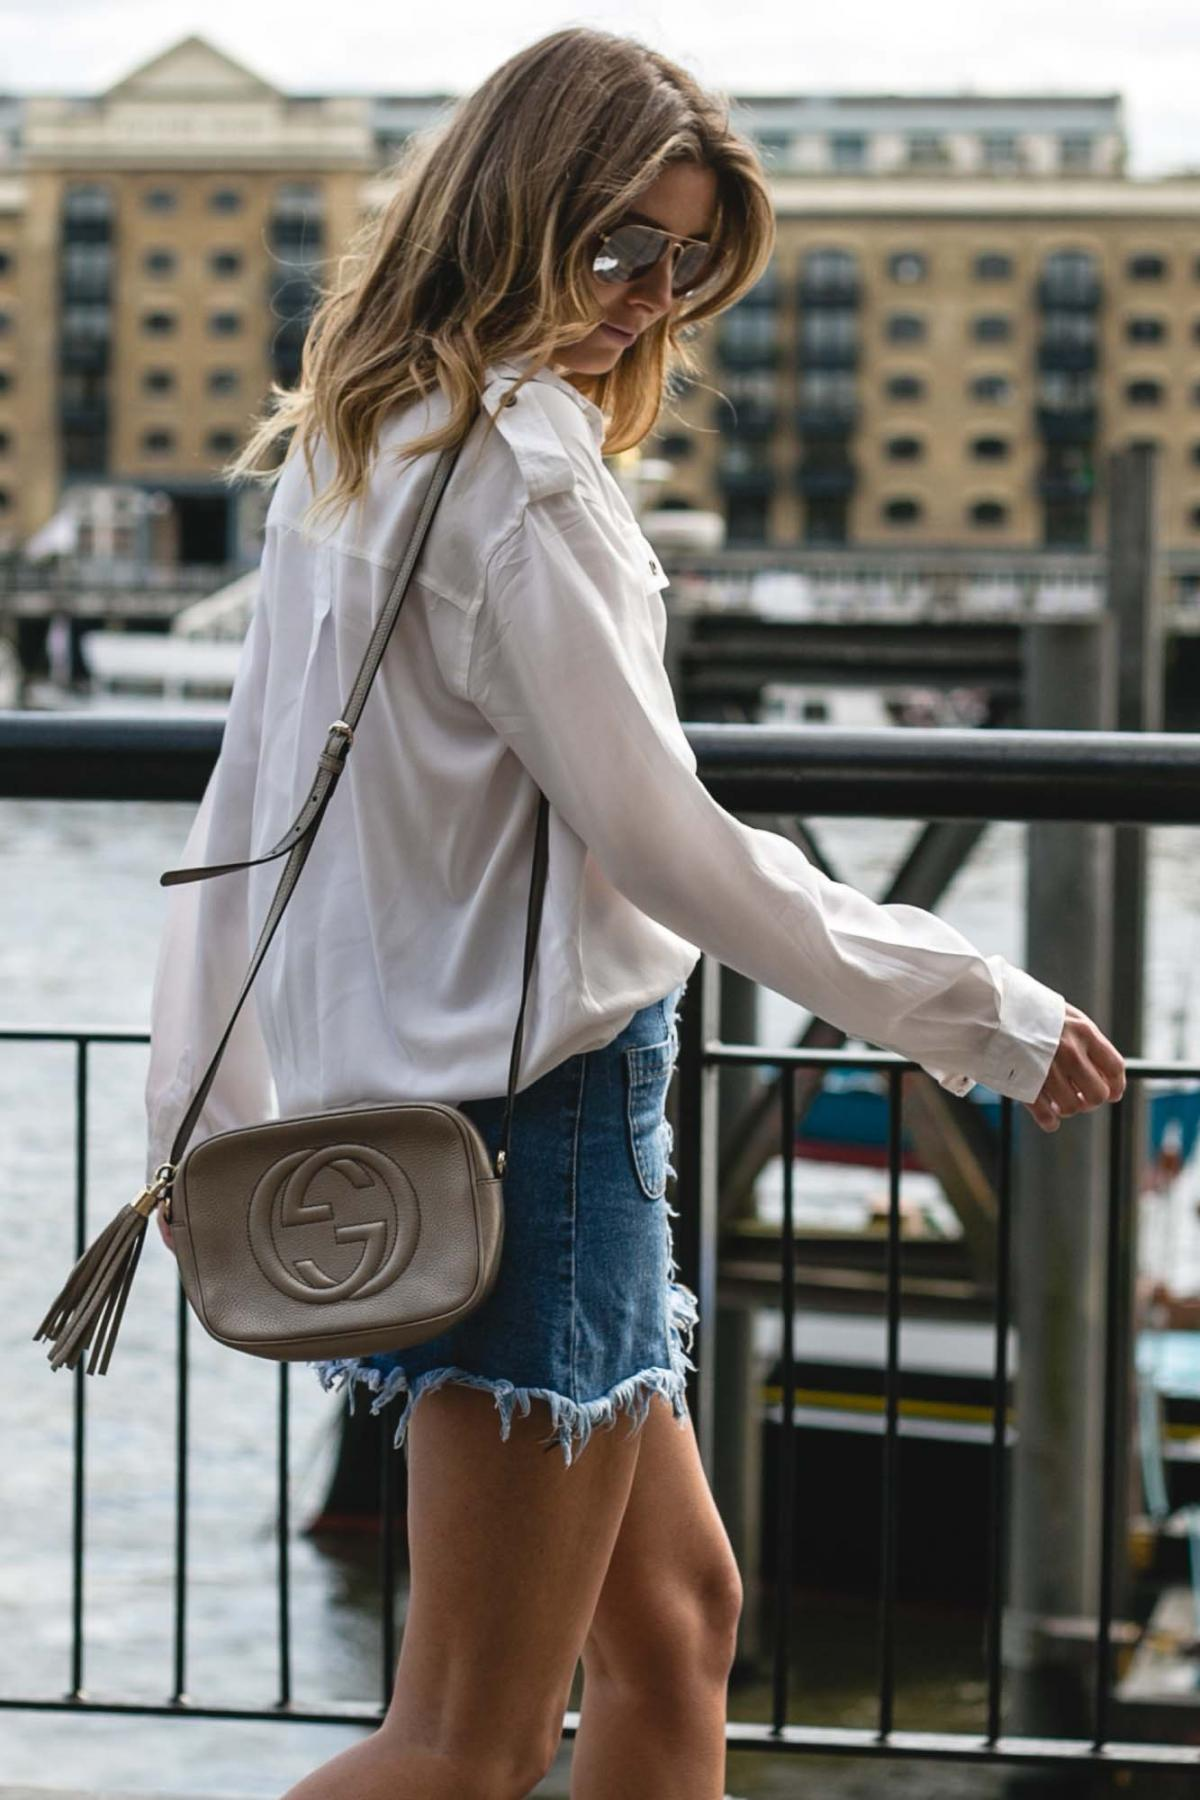 metallic gucci disco soho bag, frayed denim skirt, white military shirt